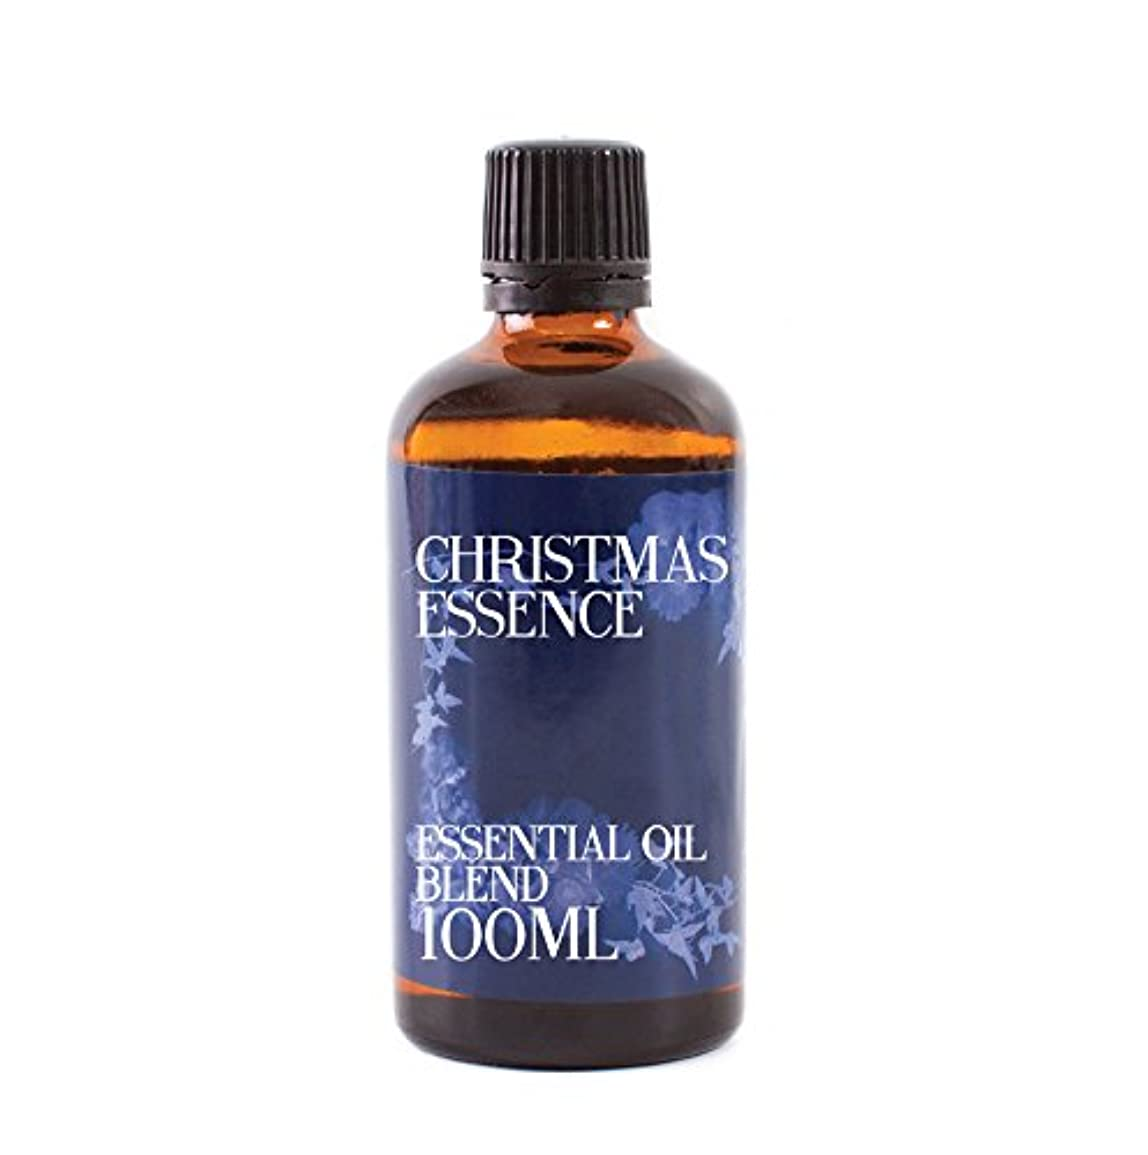 共感する化学多様性Mystix London | Christmas Essence Essential Oil Blend - 100ml - 100% Pure